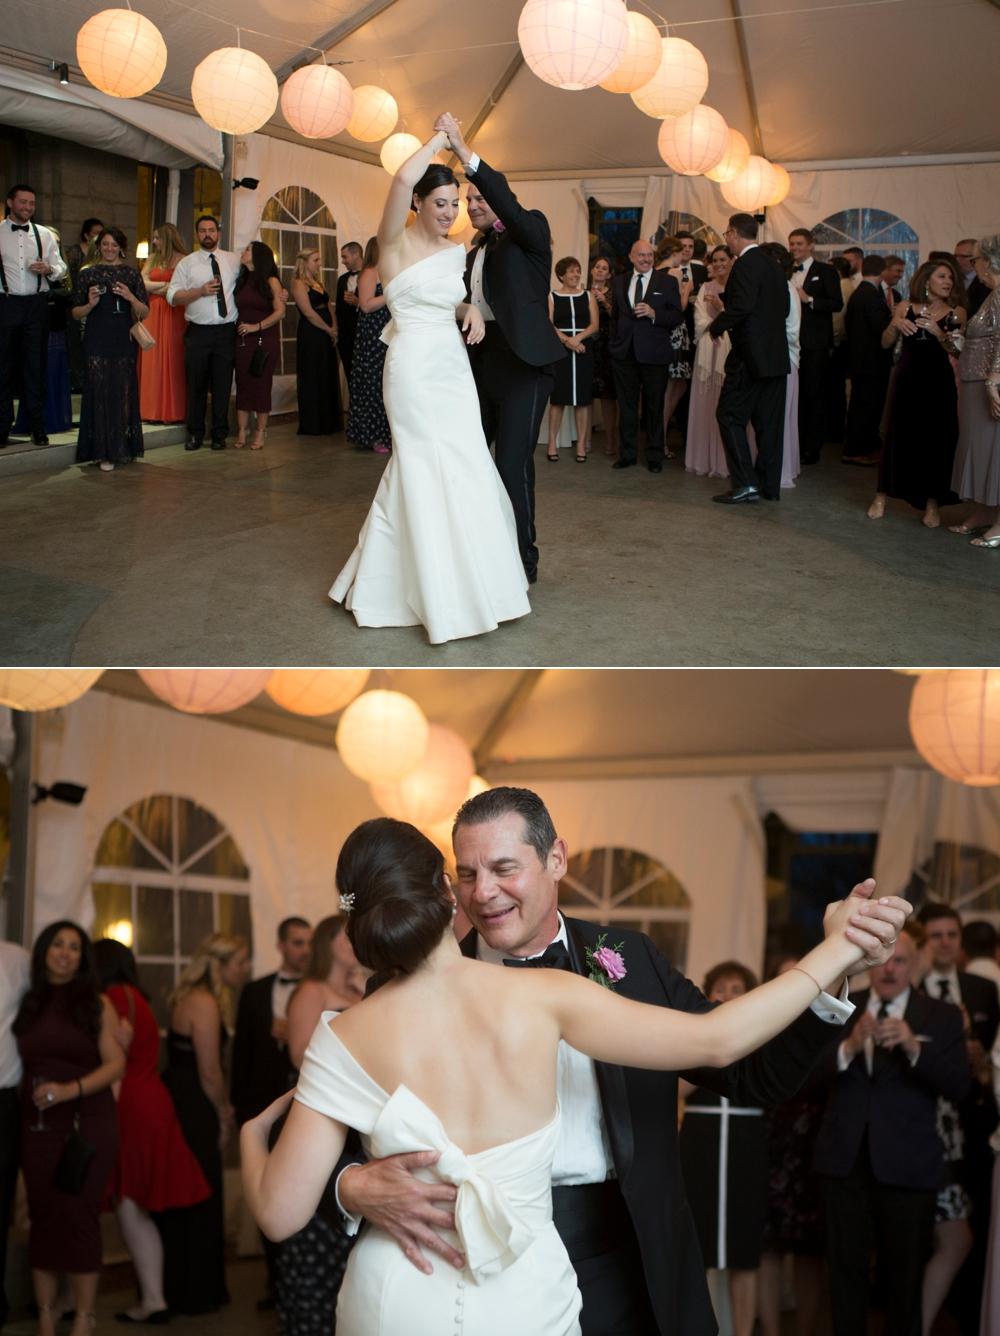 EoilaMansion_Wedding_Leah&Tom_0044.jpg